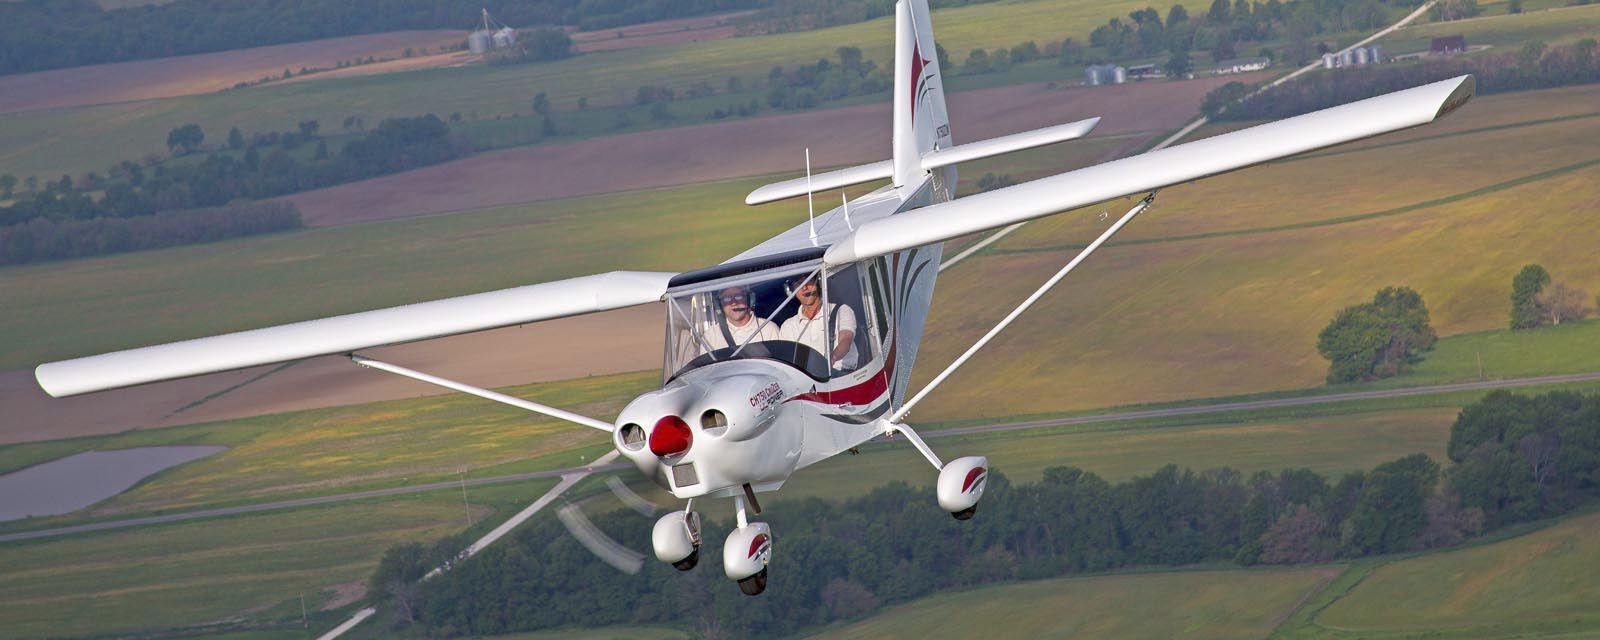 2-person LSA / 4-stroke engine / single-engine / kit - CH750